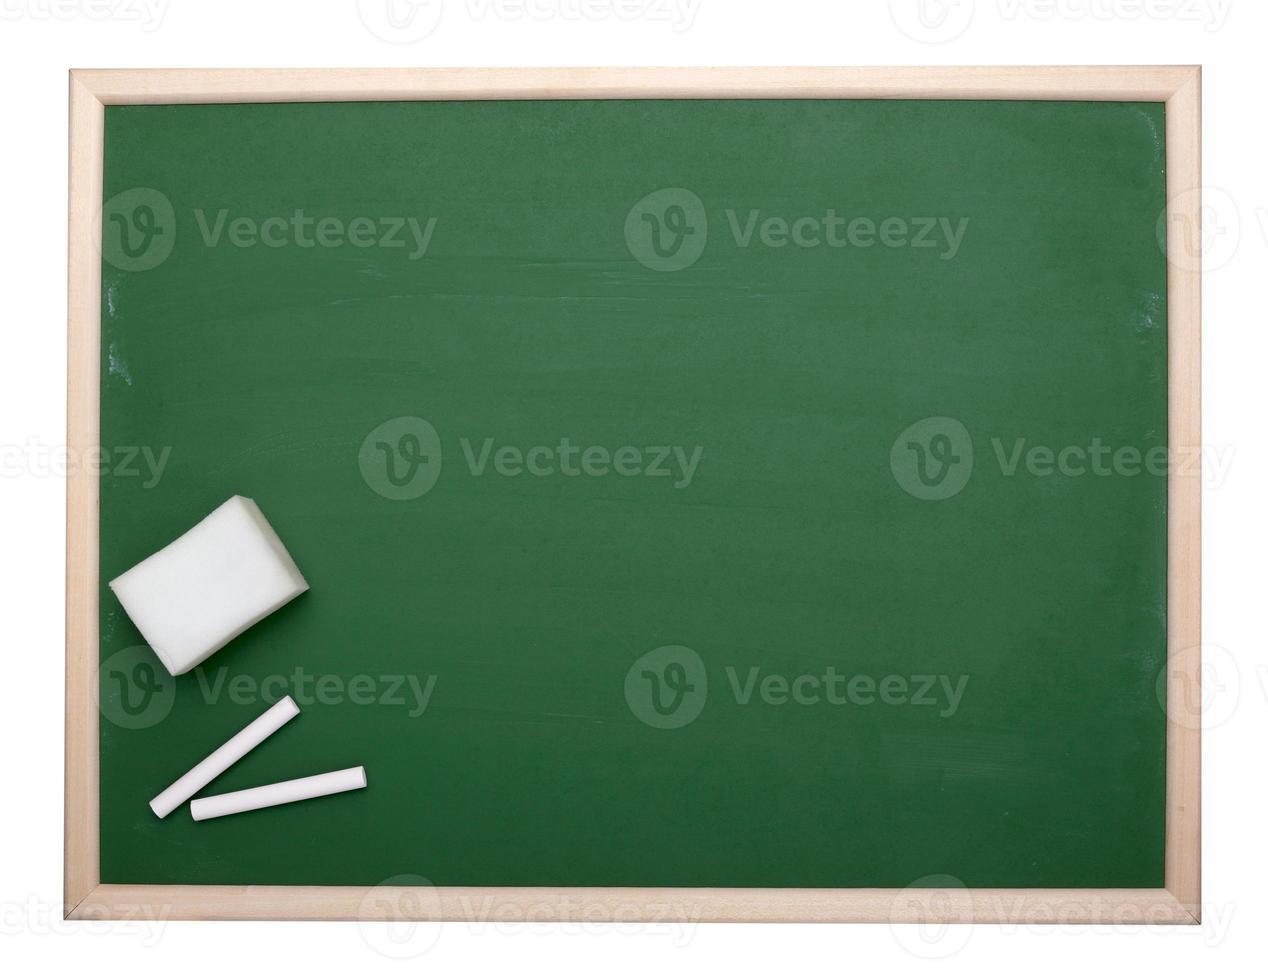 pizarra aula educación escolar foto